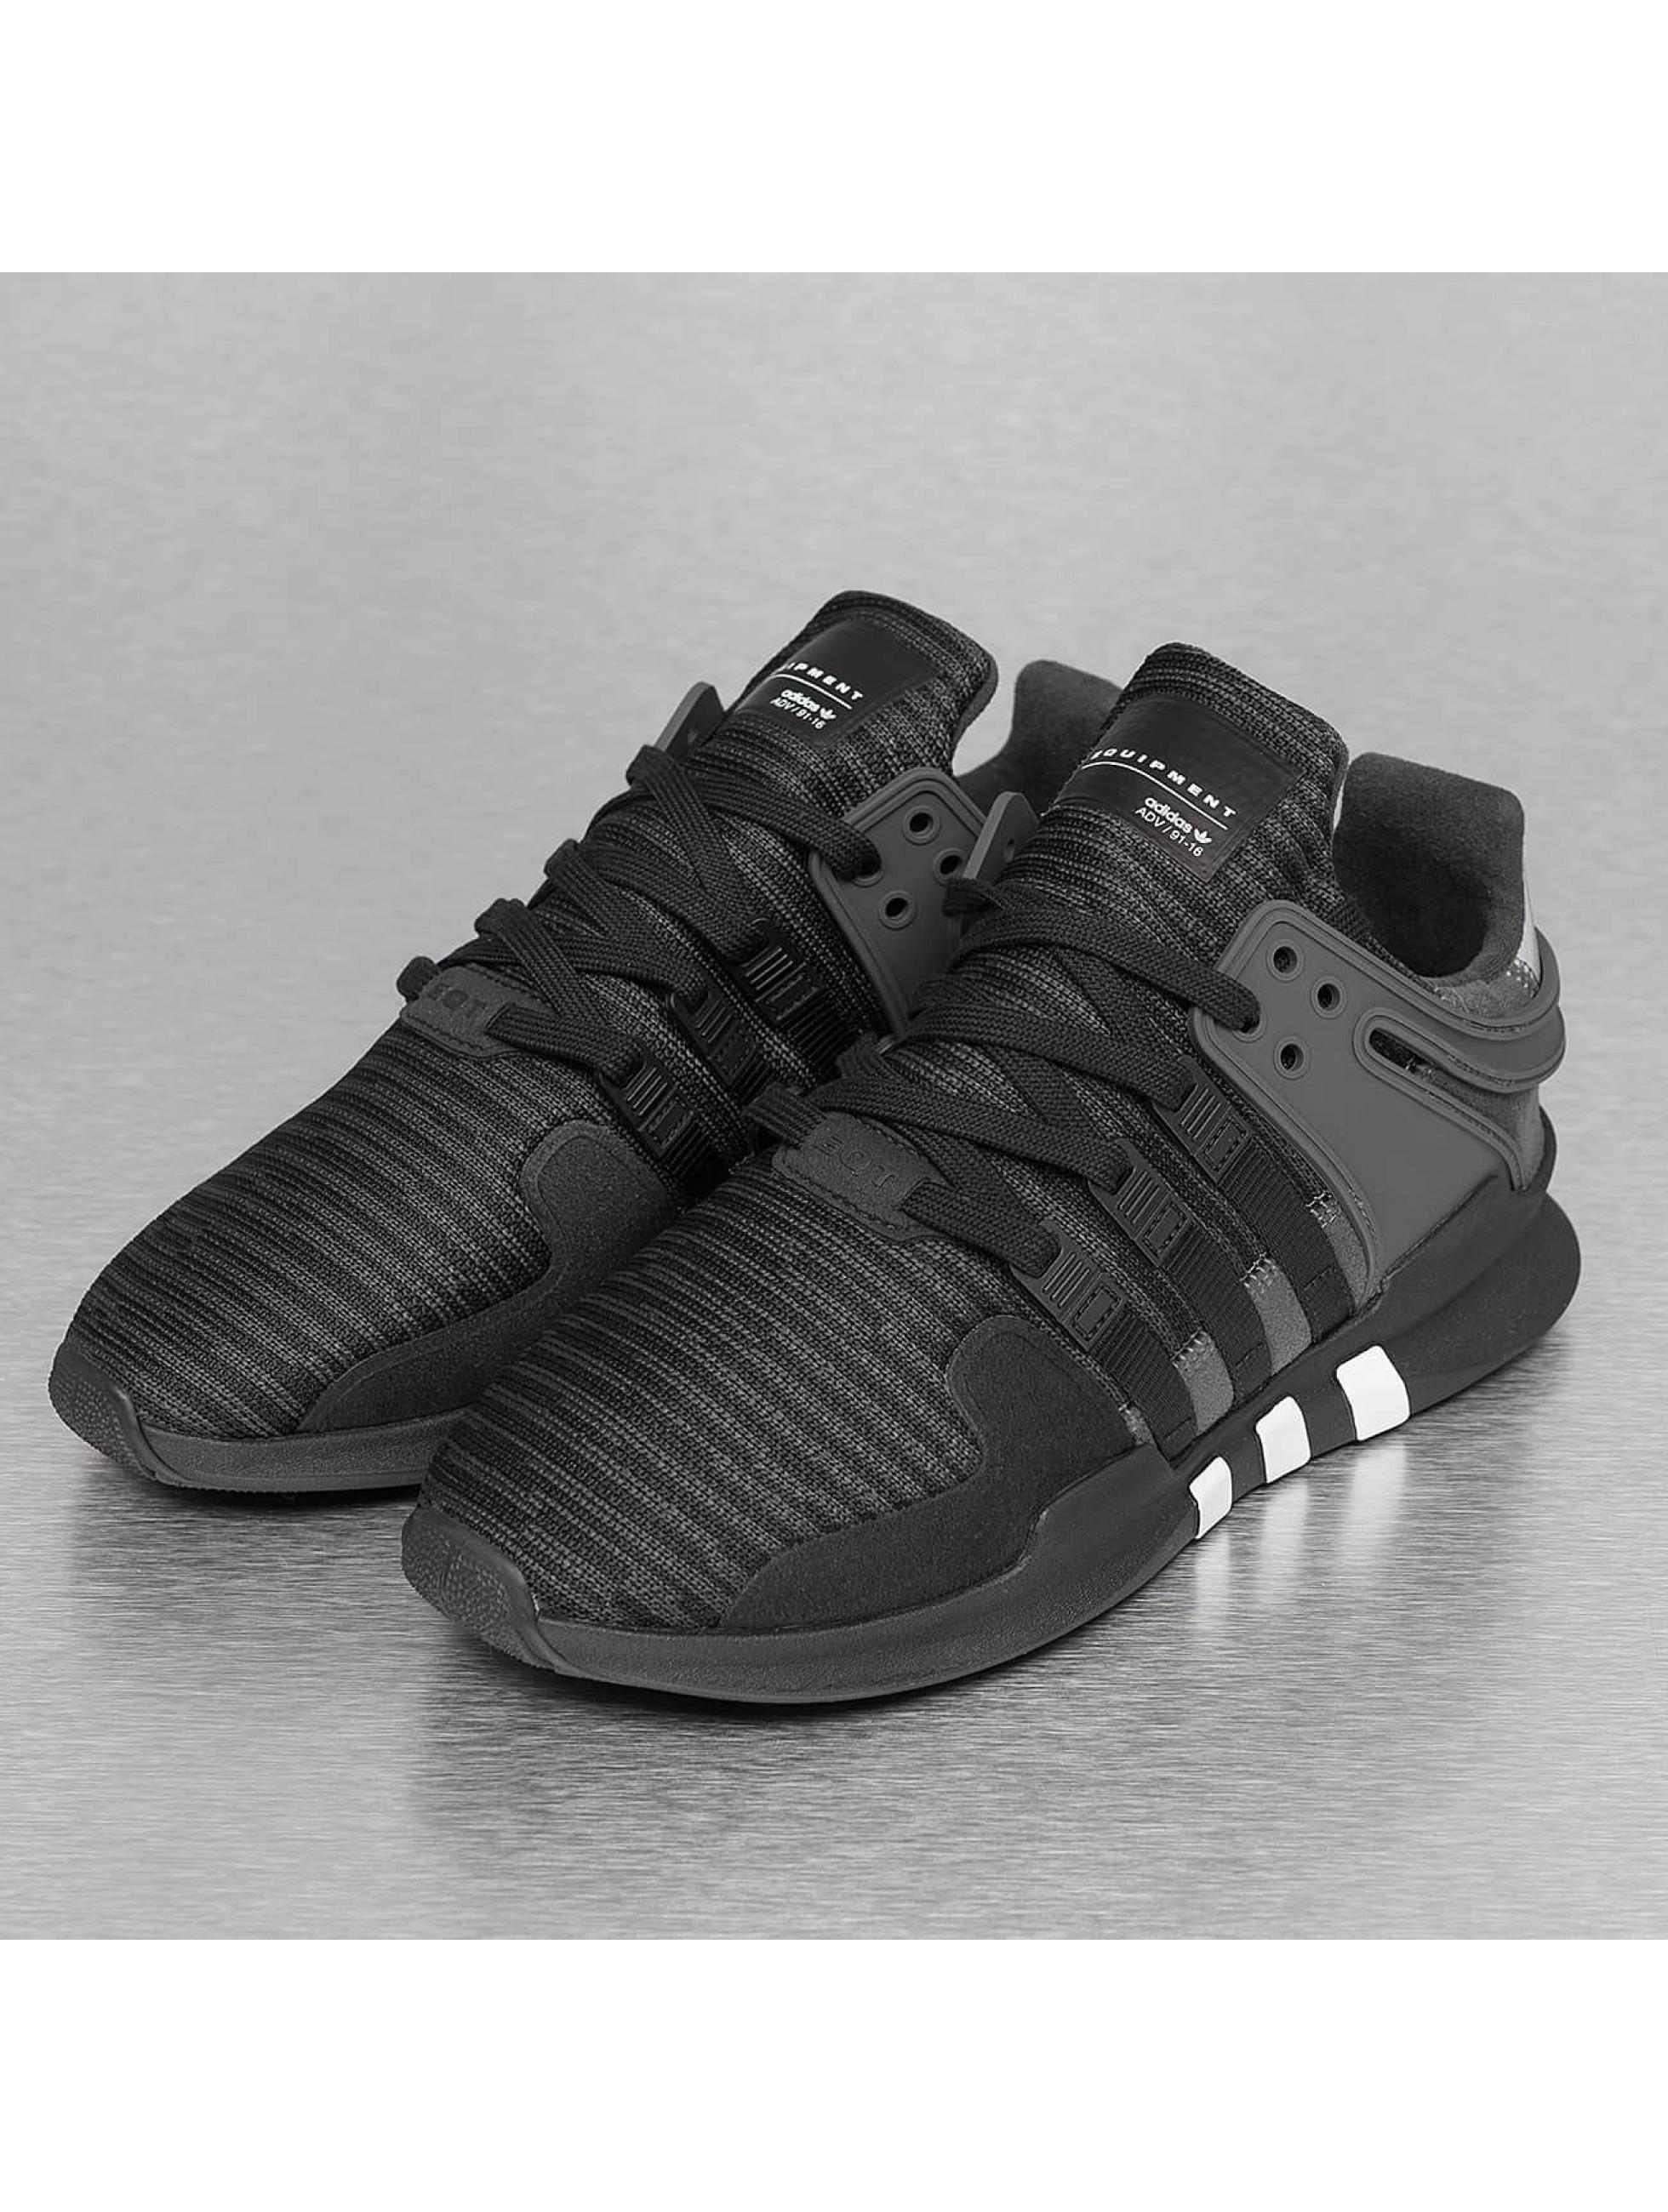 adidas damen schuhe sneaker equipment support adv ebay. Black Bedroom Furniture Sets. Home Design Ideas